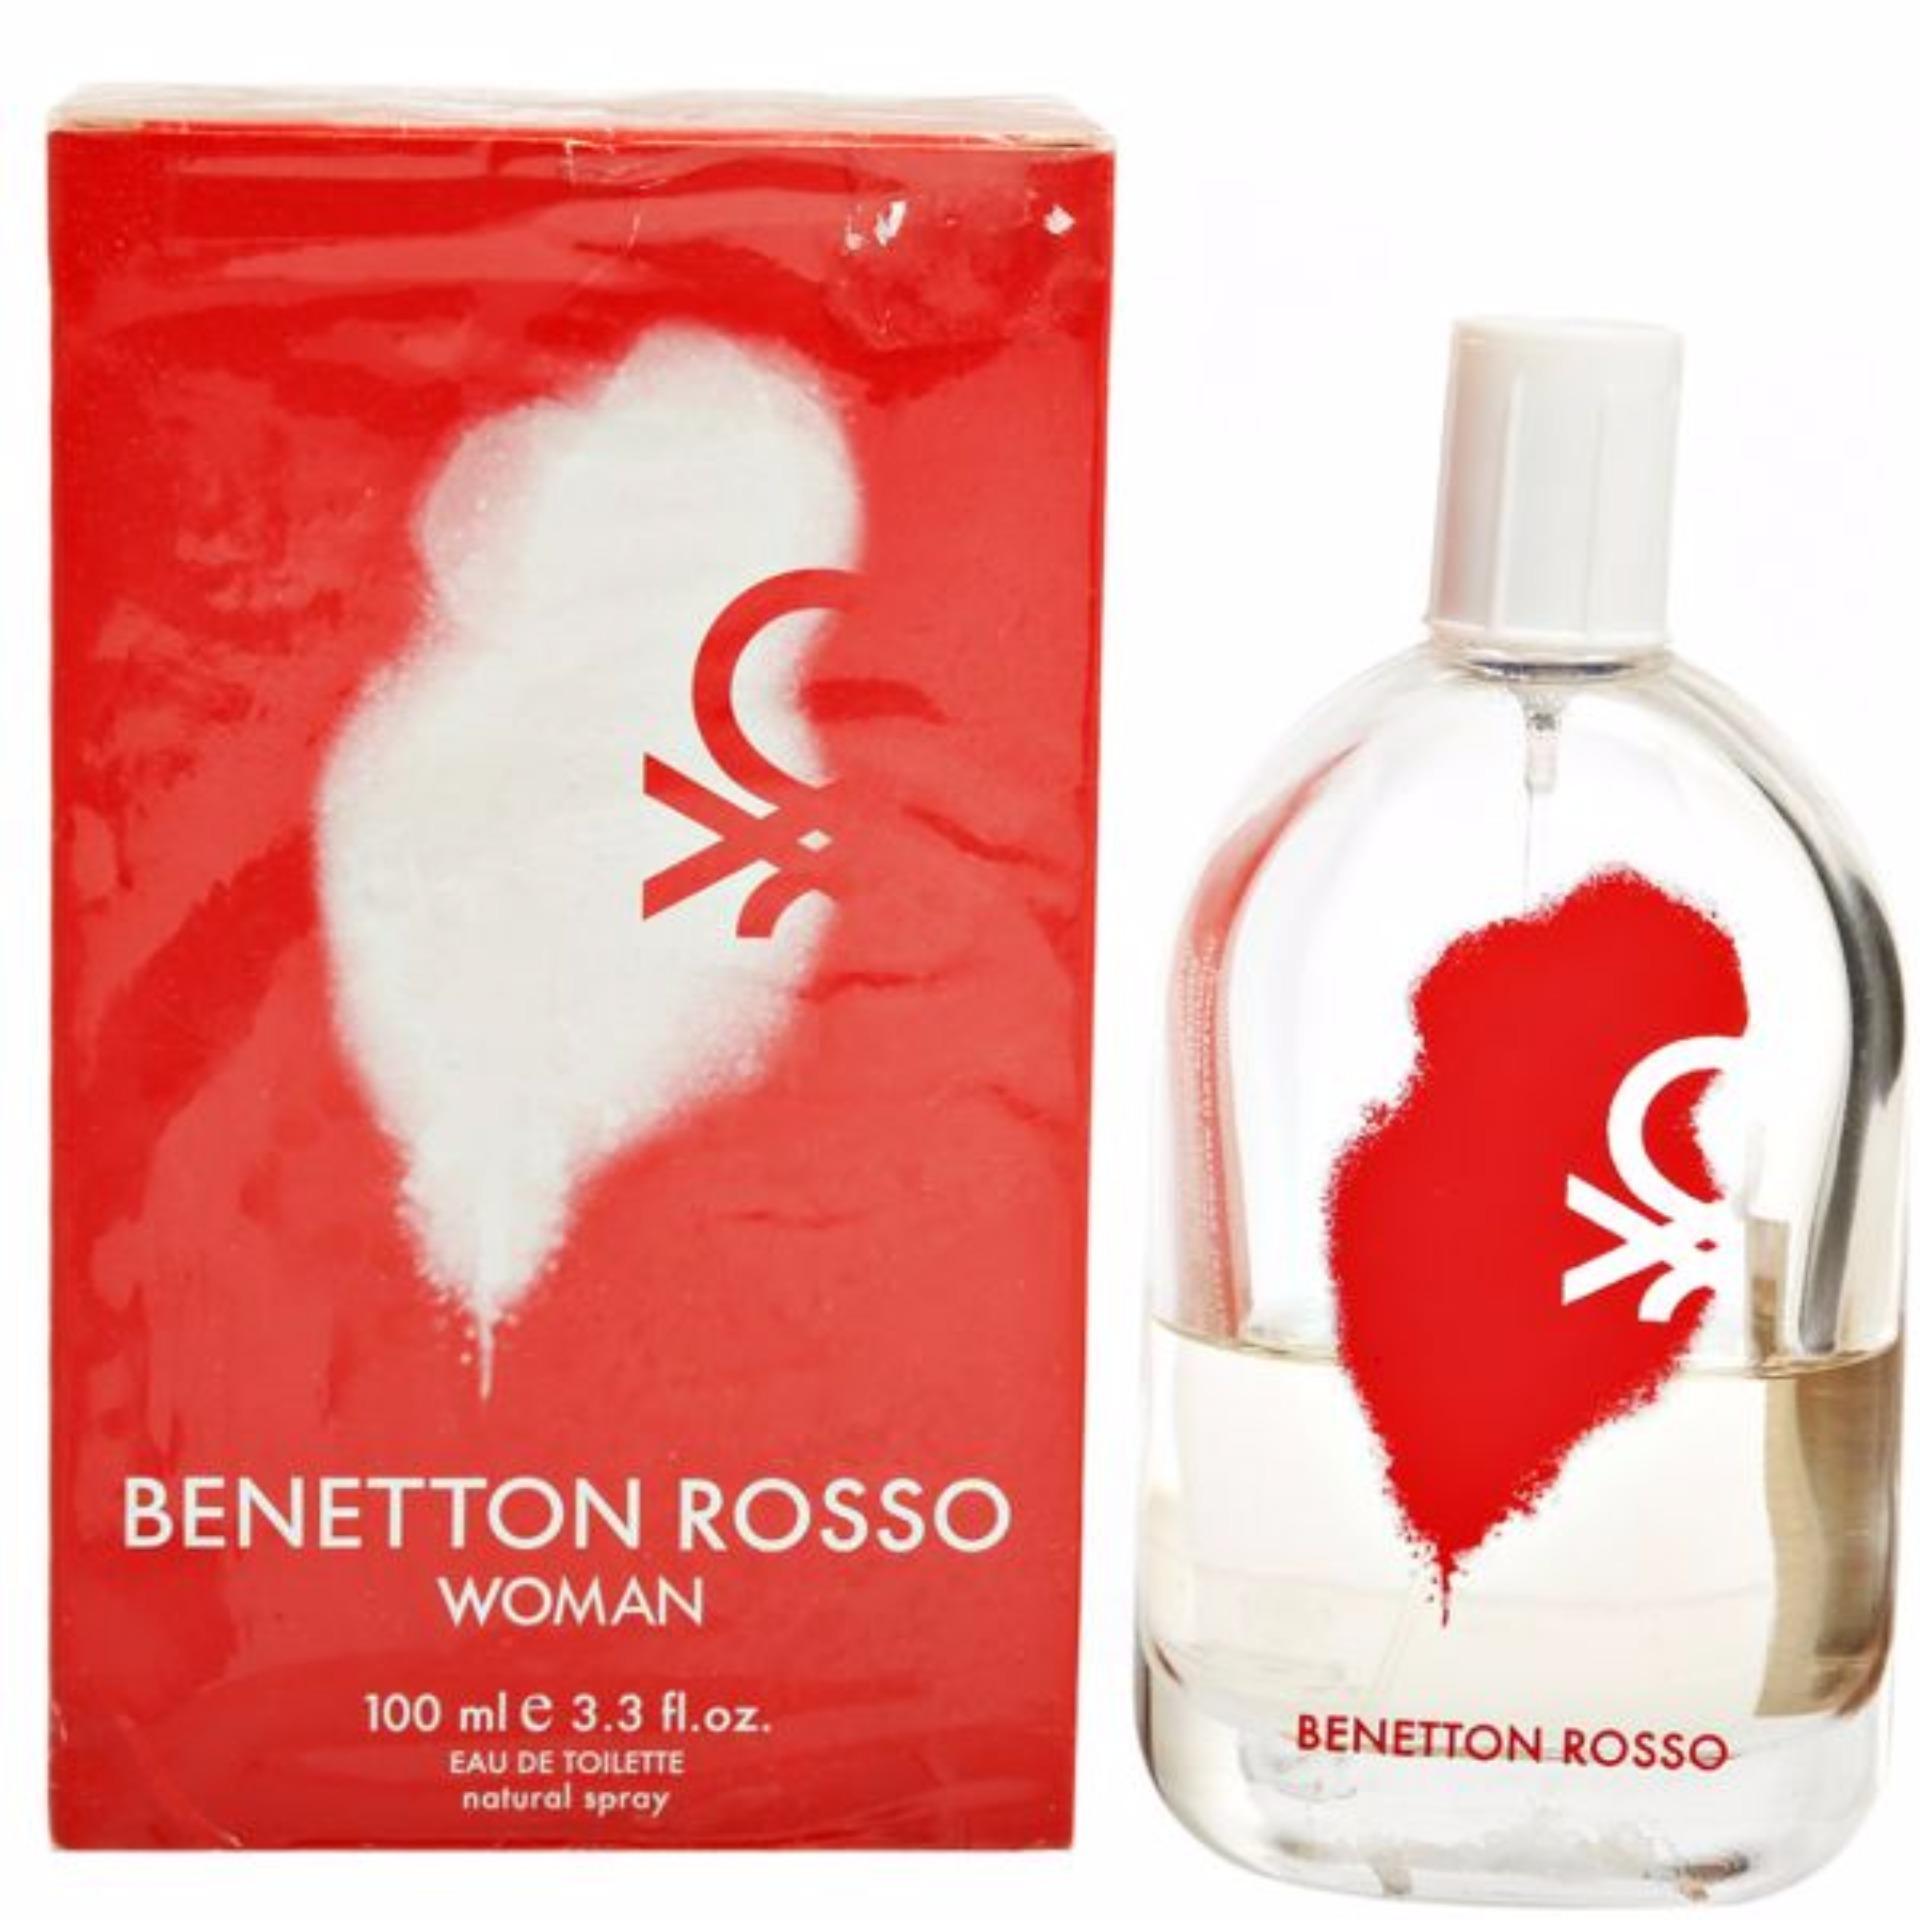 Benetton Rosso Woman 100ml